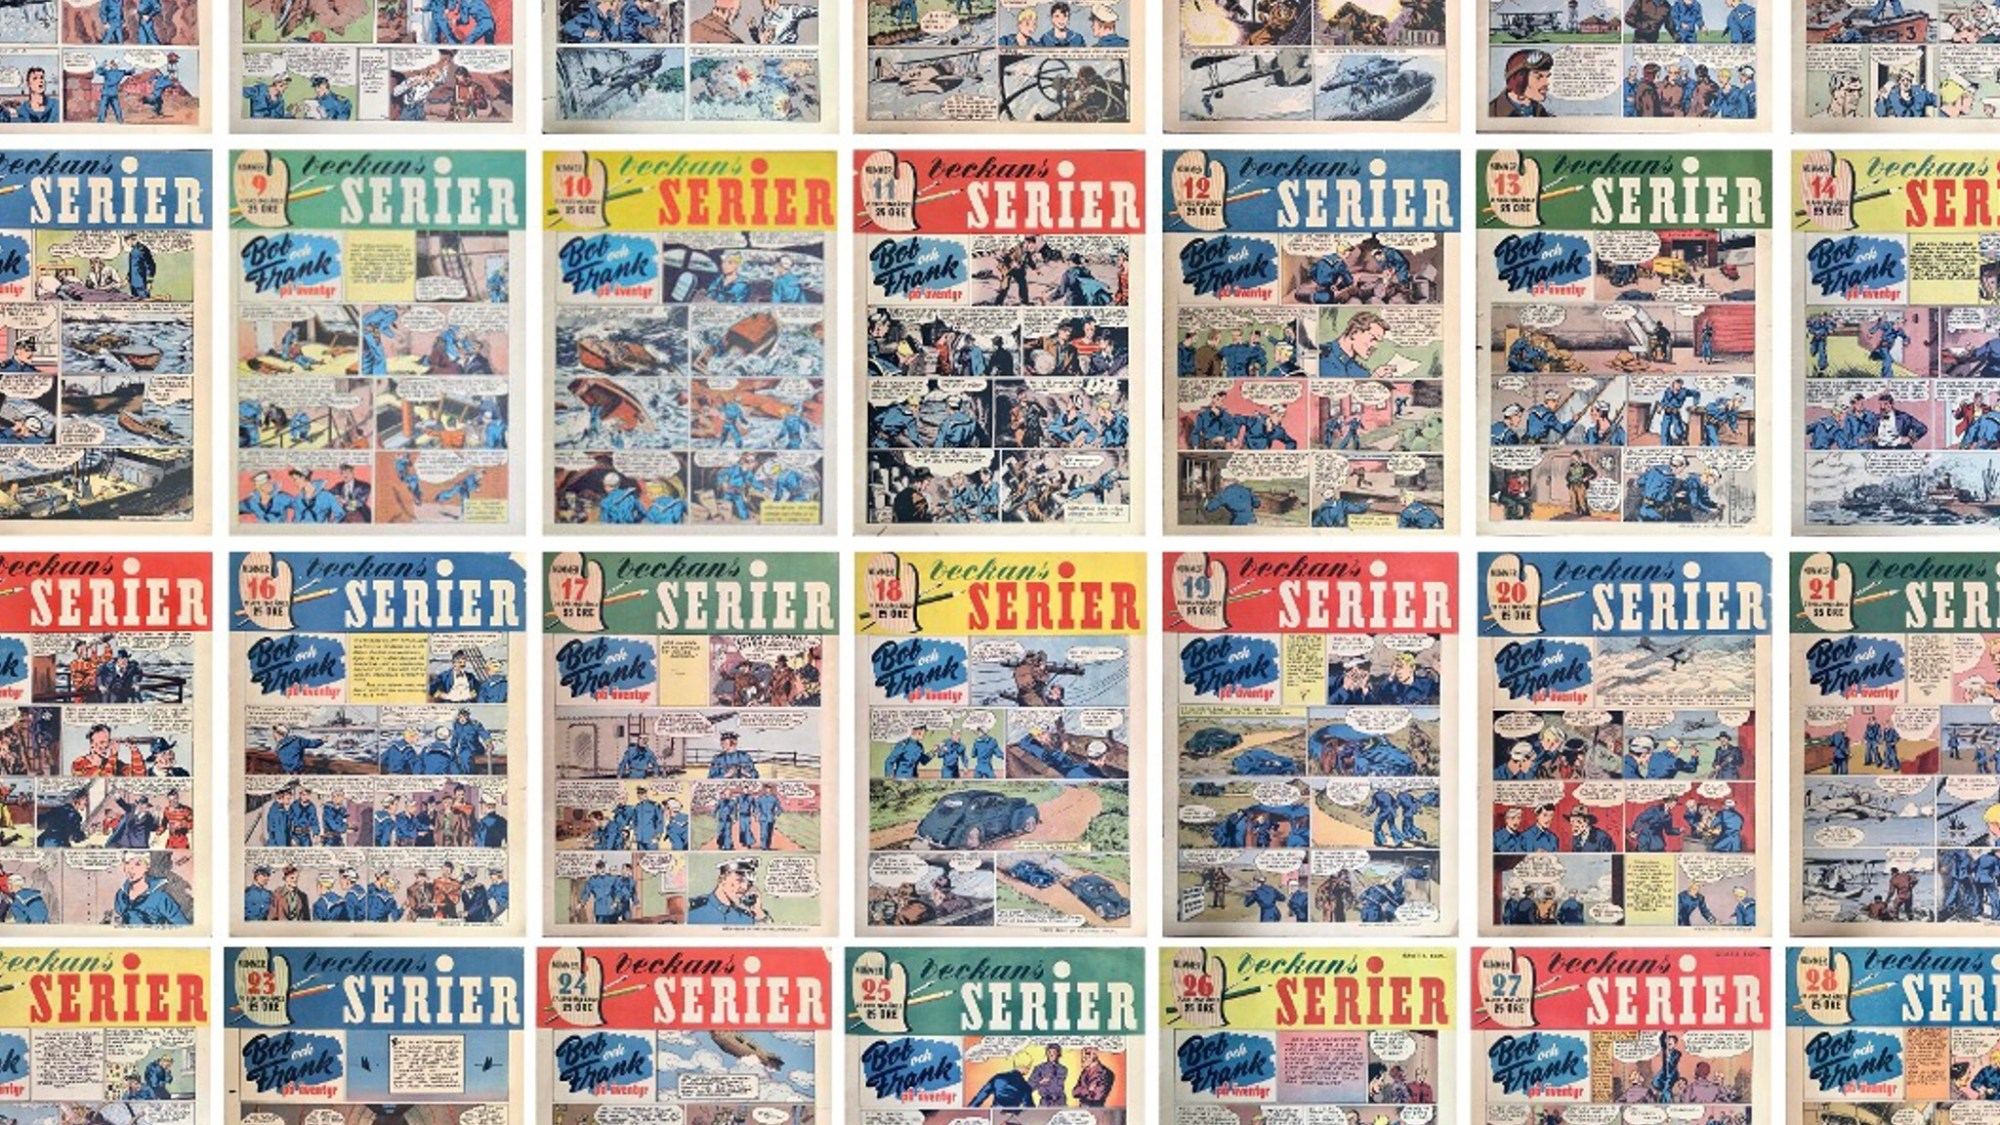 Veckans serier 1942-43